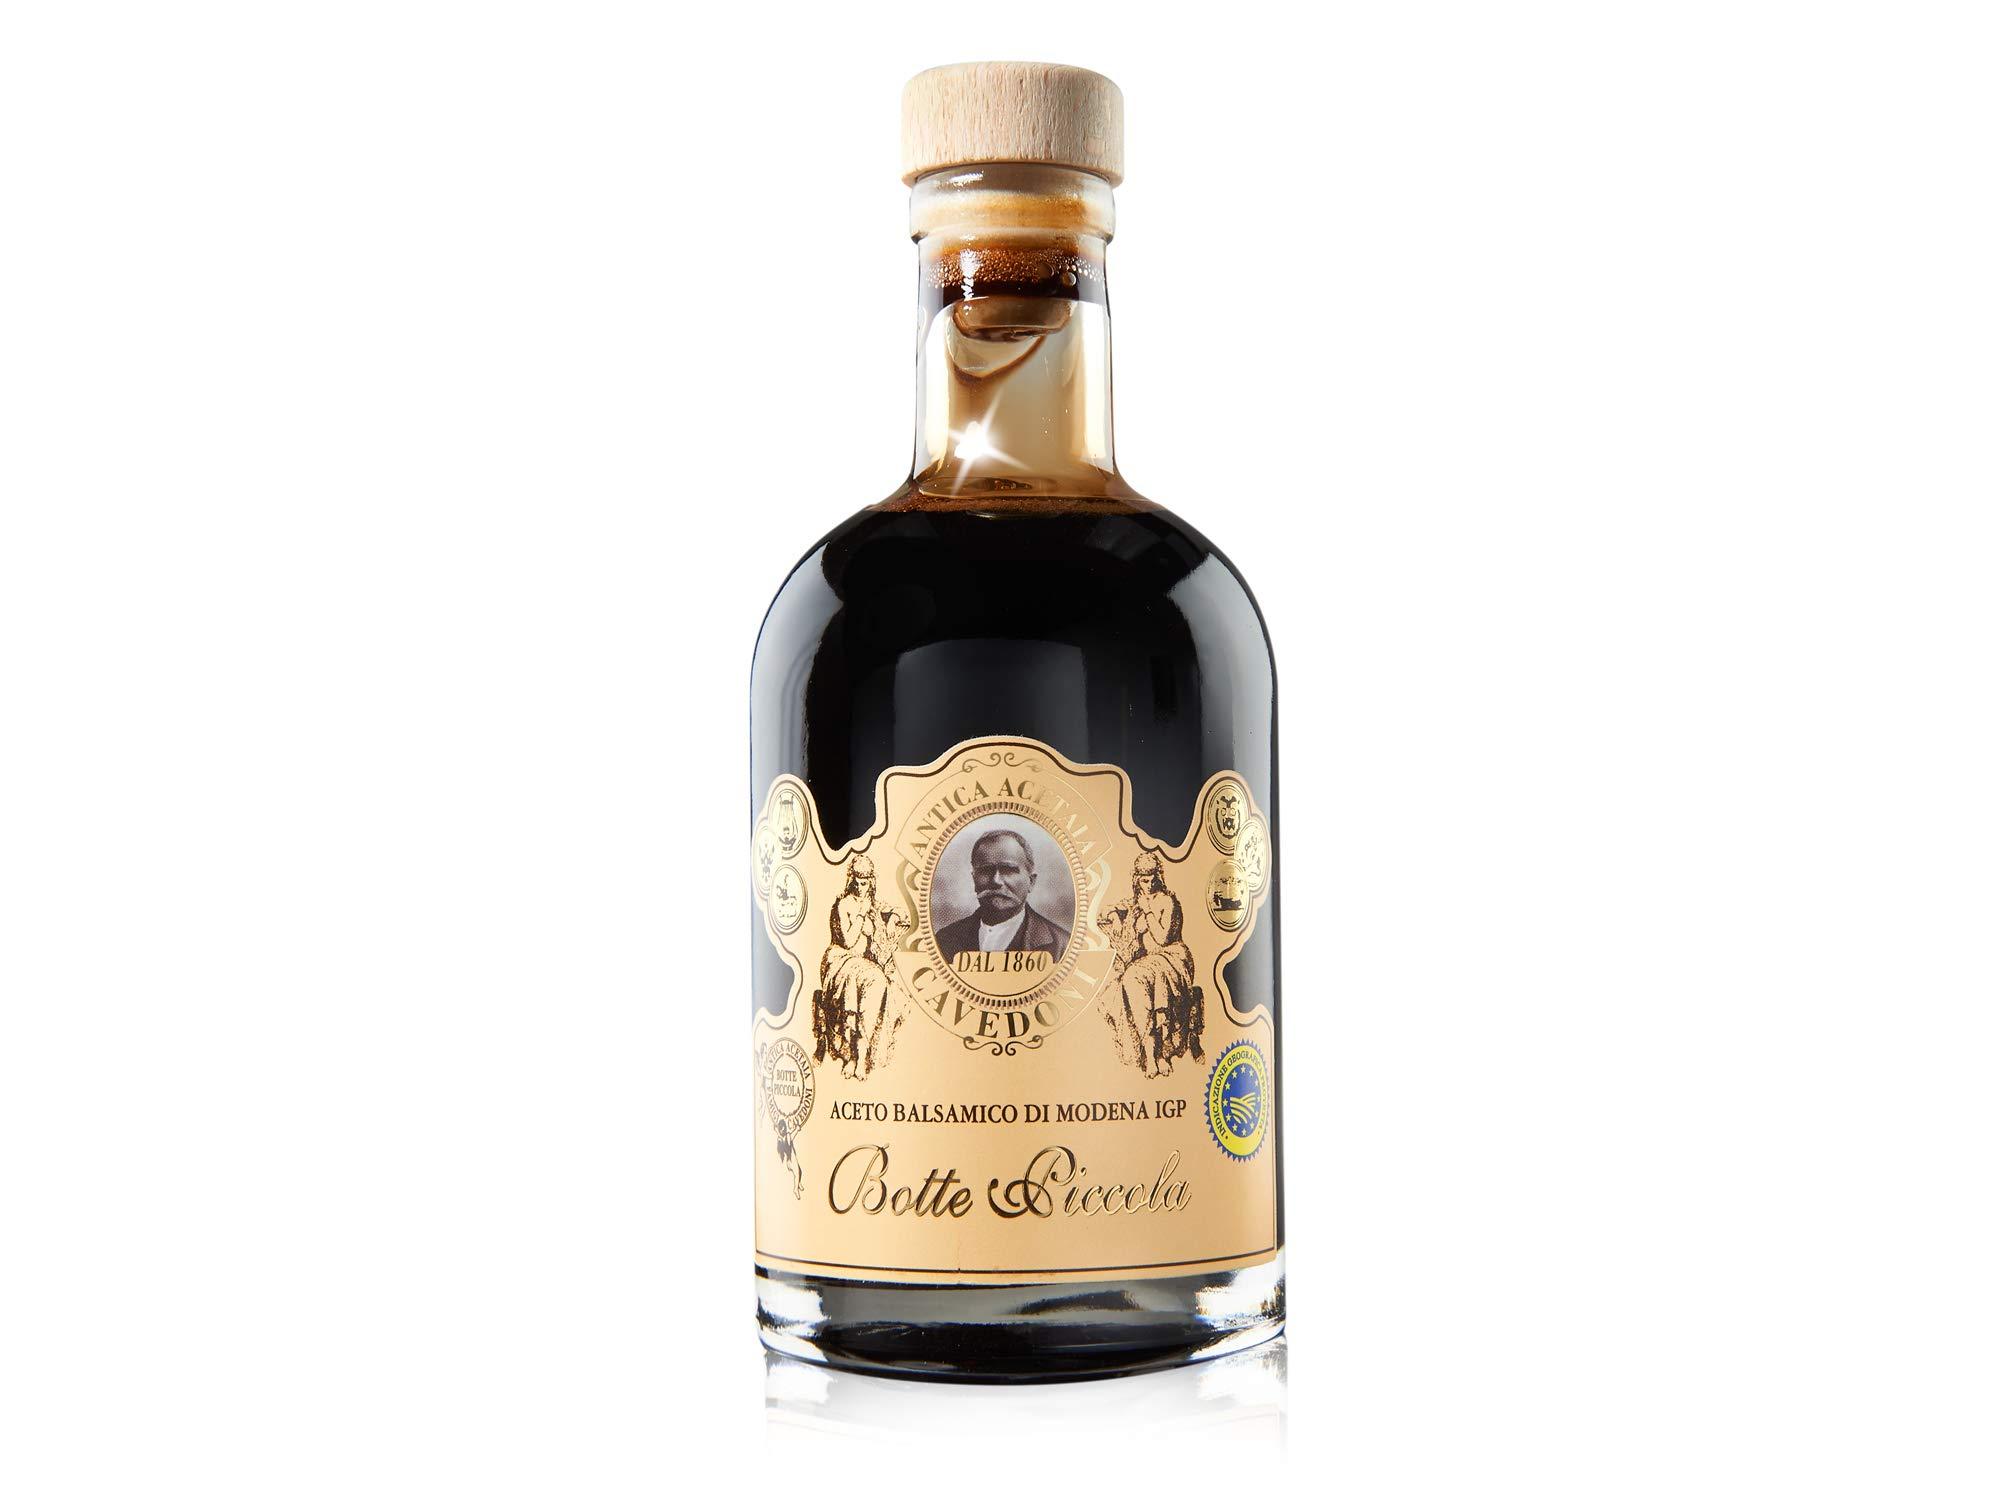 Botte Piccola Balsamic Vinegar IGP, 250ml Bottle by Cavedoni (Image #3)